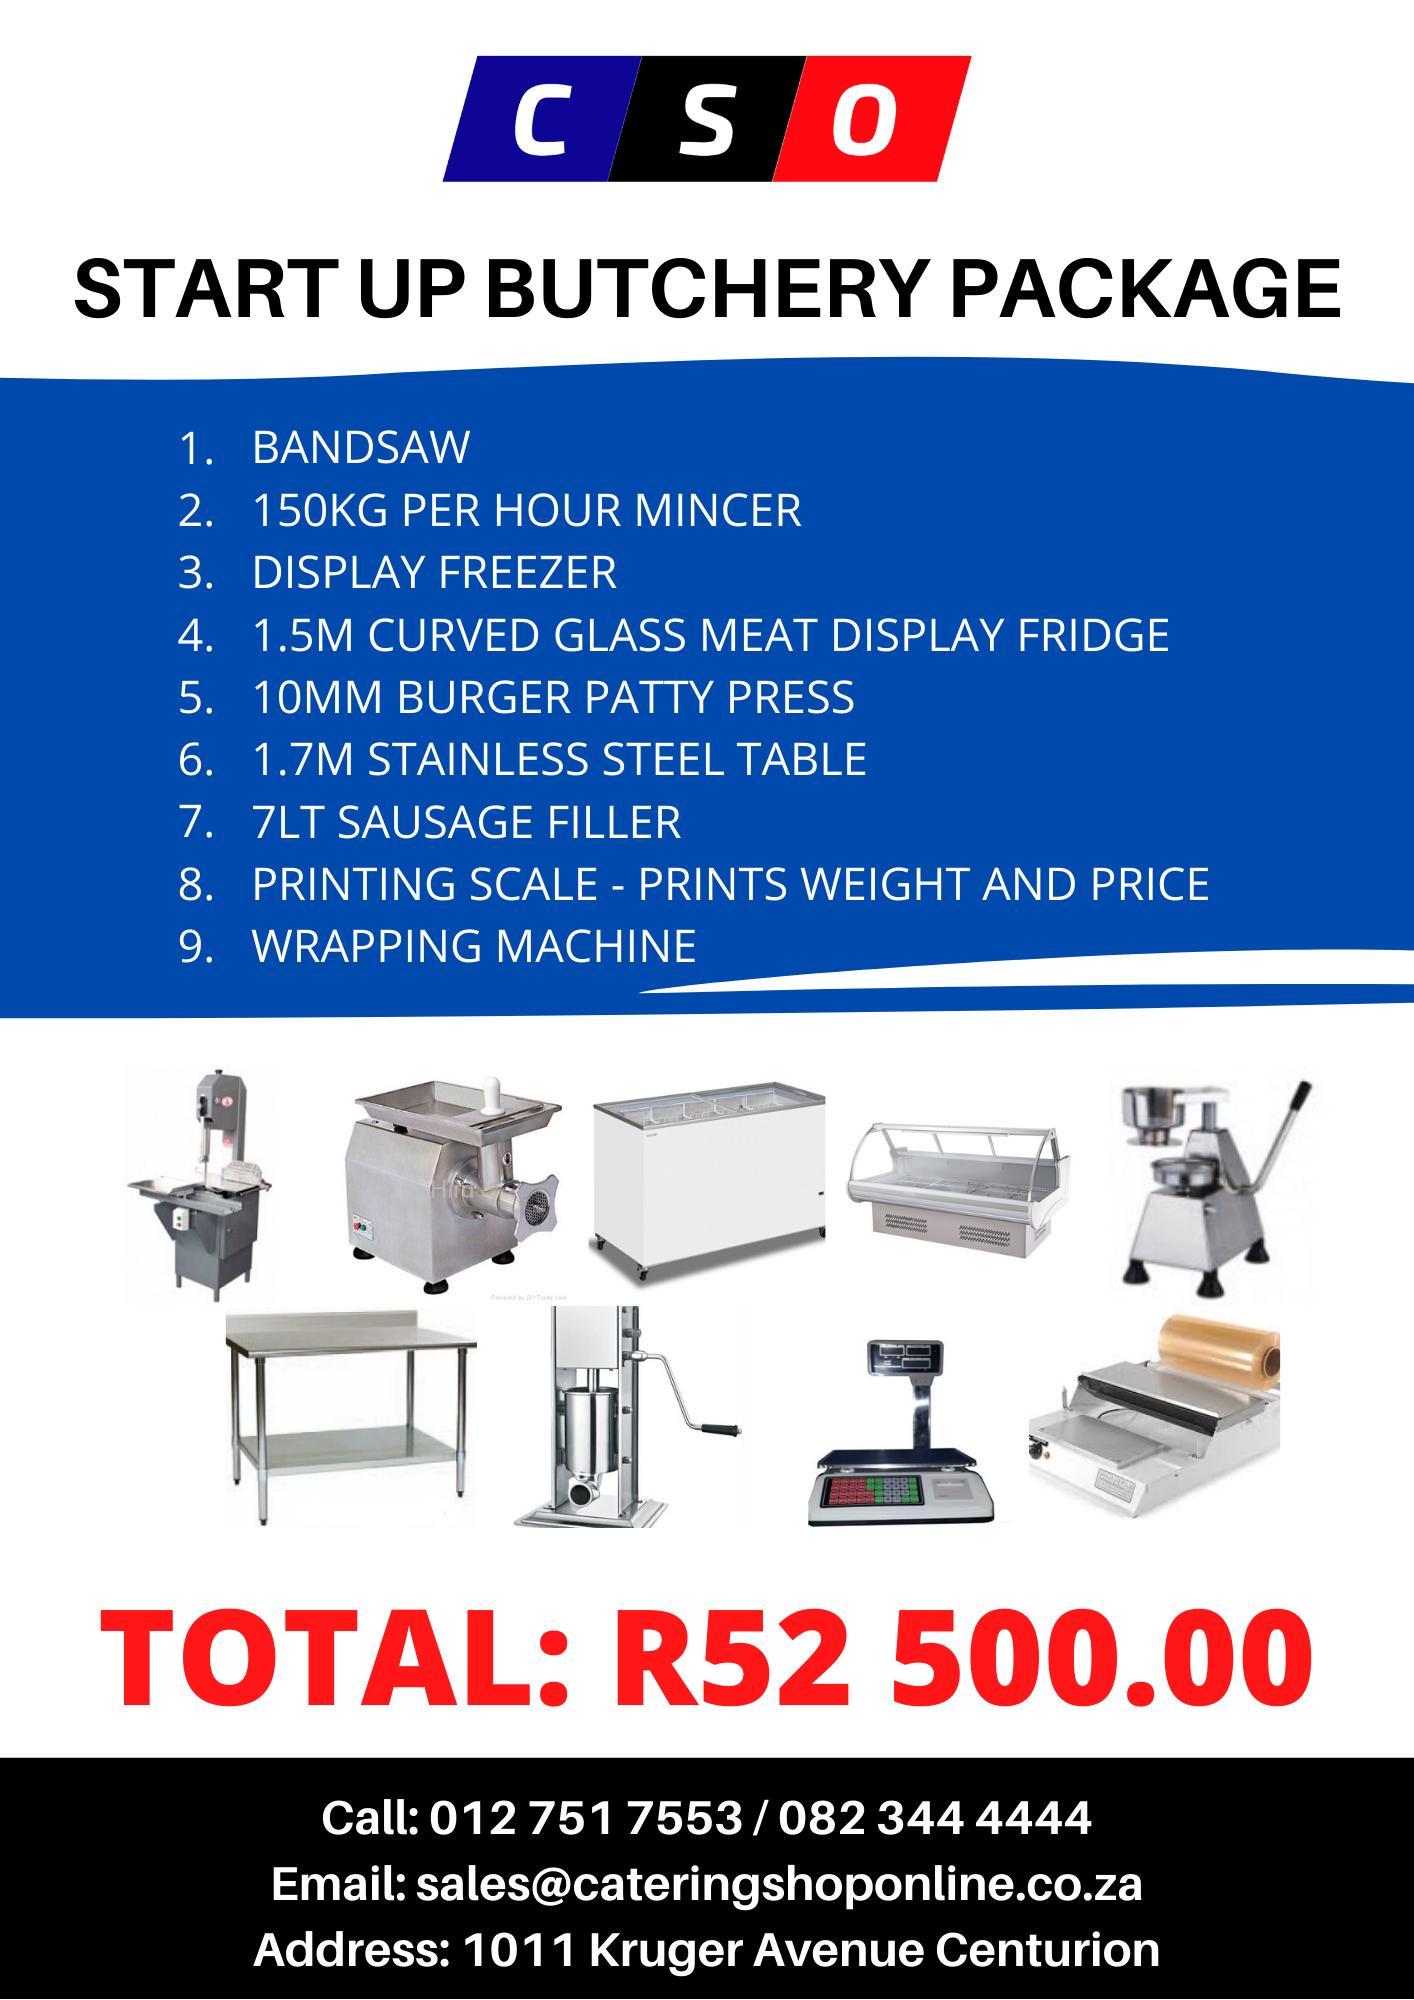 Start up butchery equipment